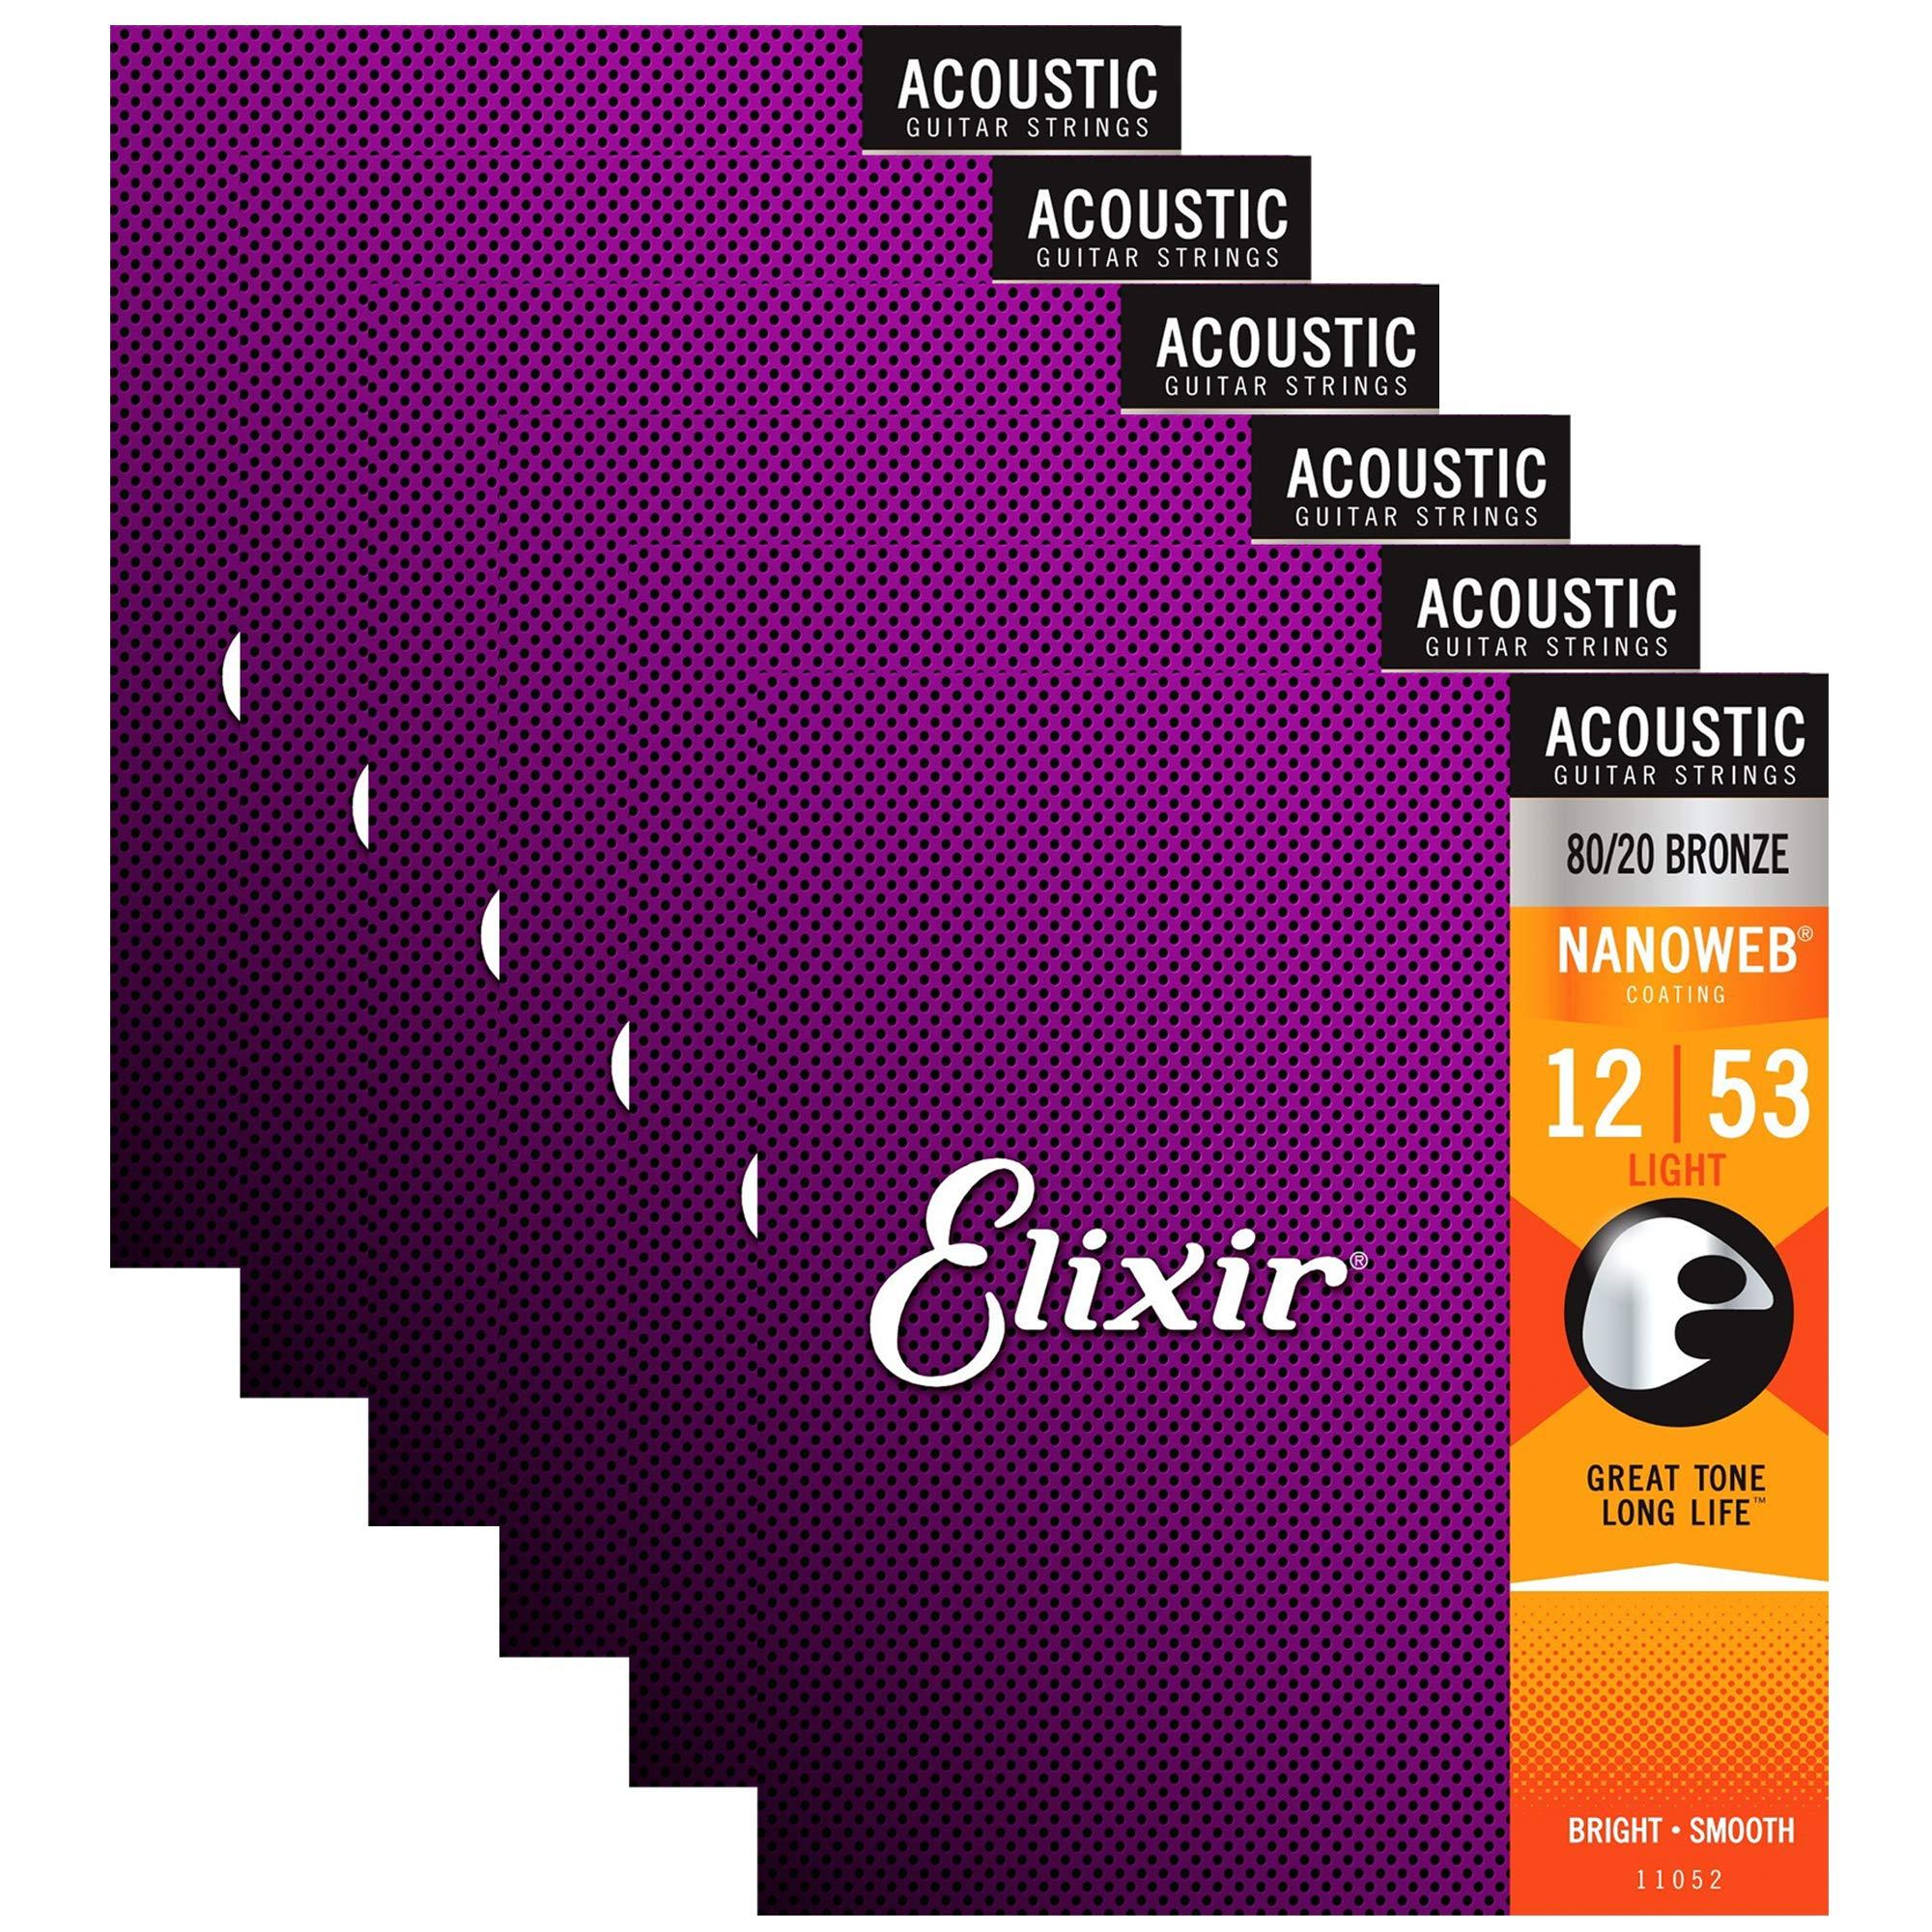 Elixir 11052 Acoustic 80/20 Nano Light 12-53 (6 Pack Bundle) by Elixir